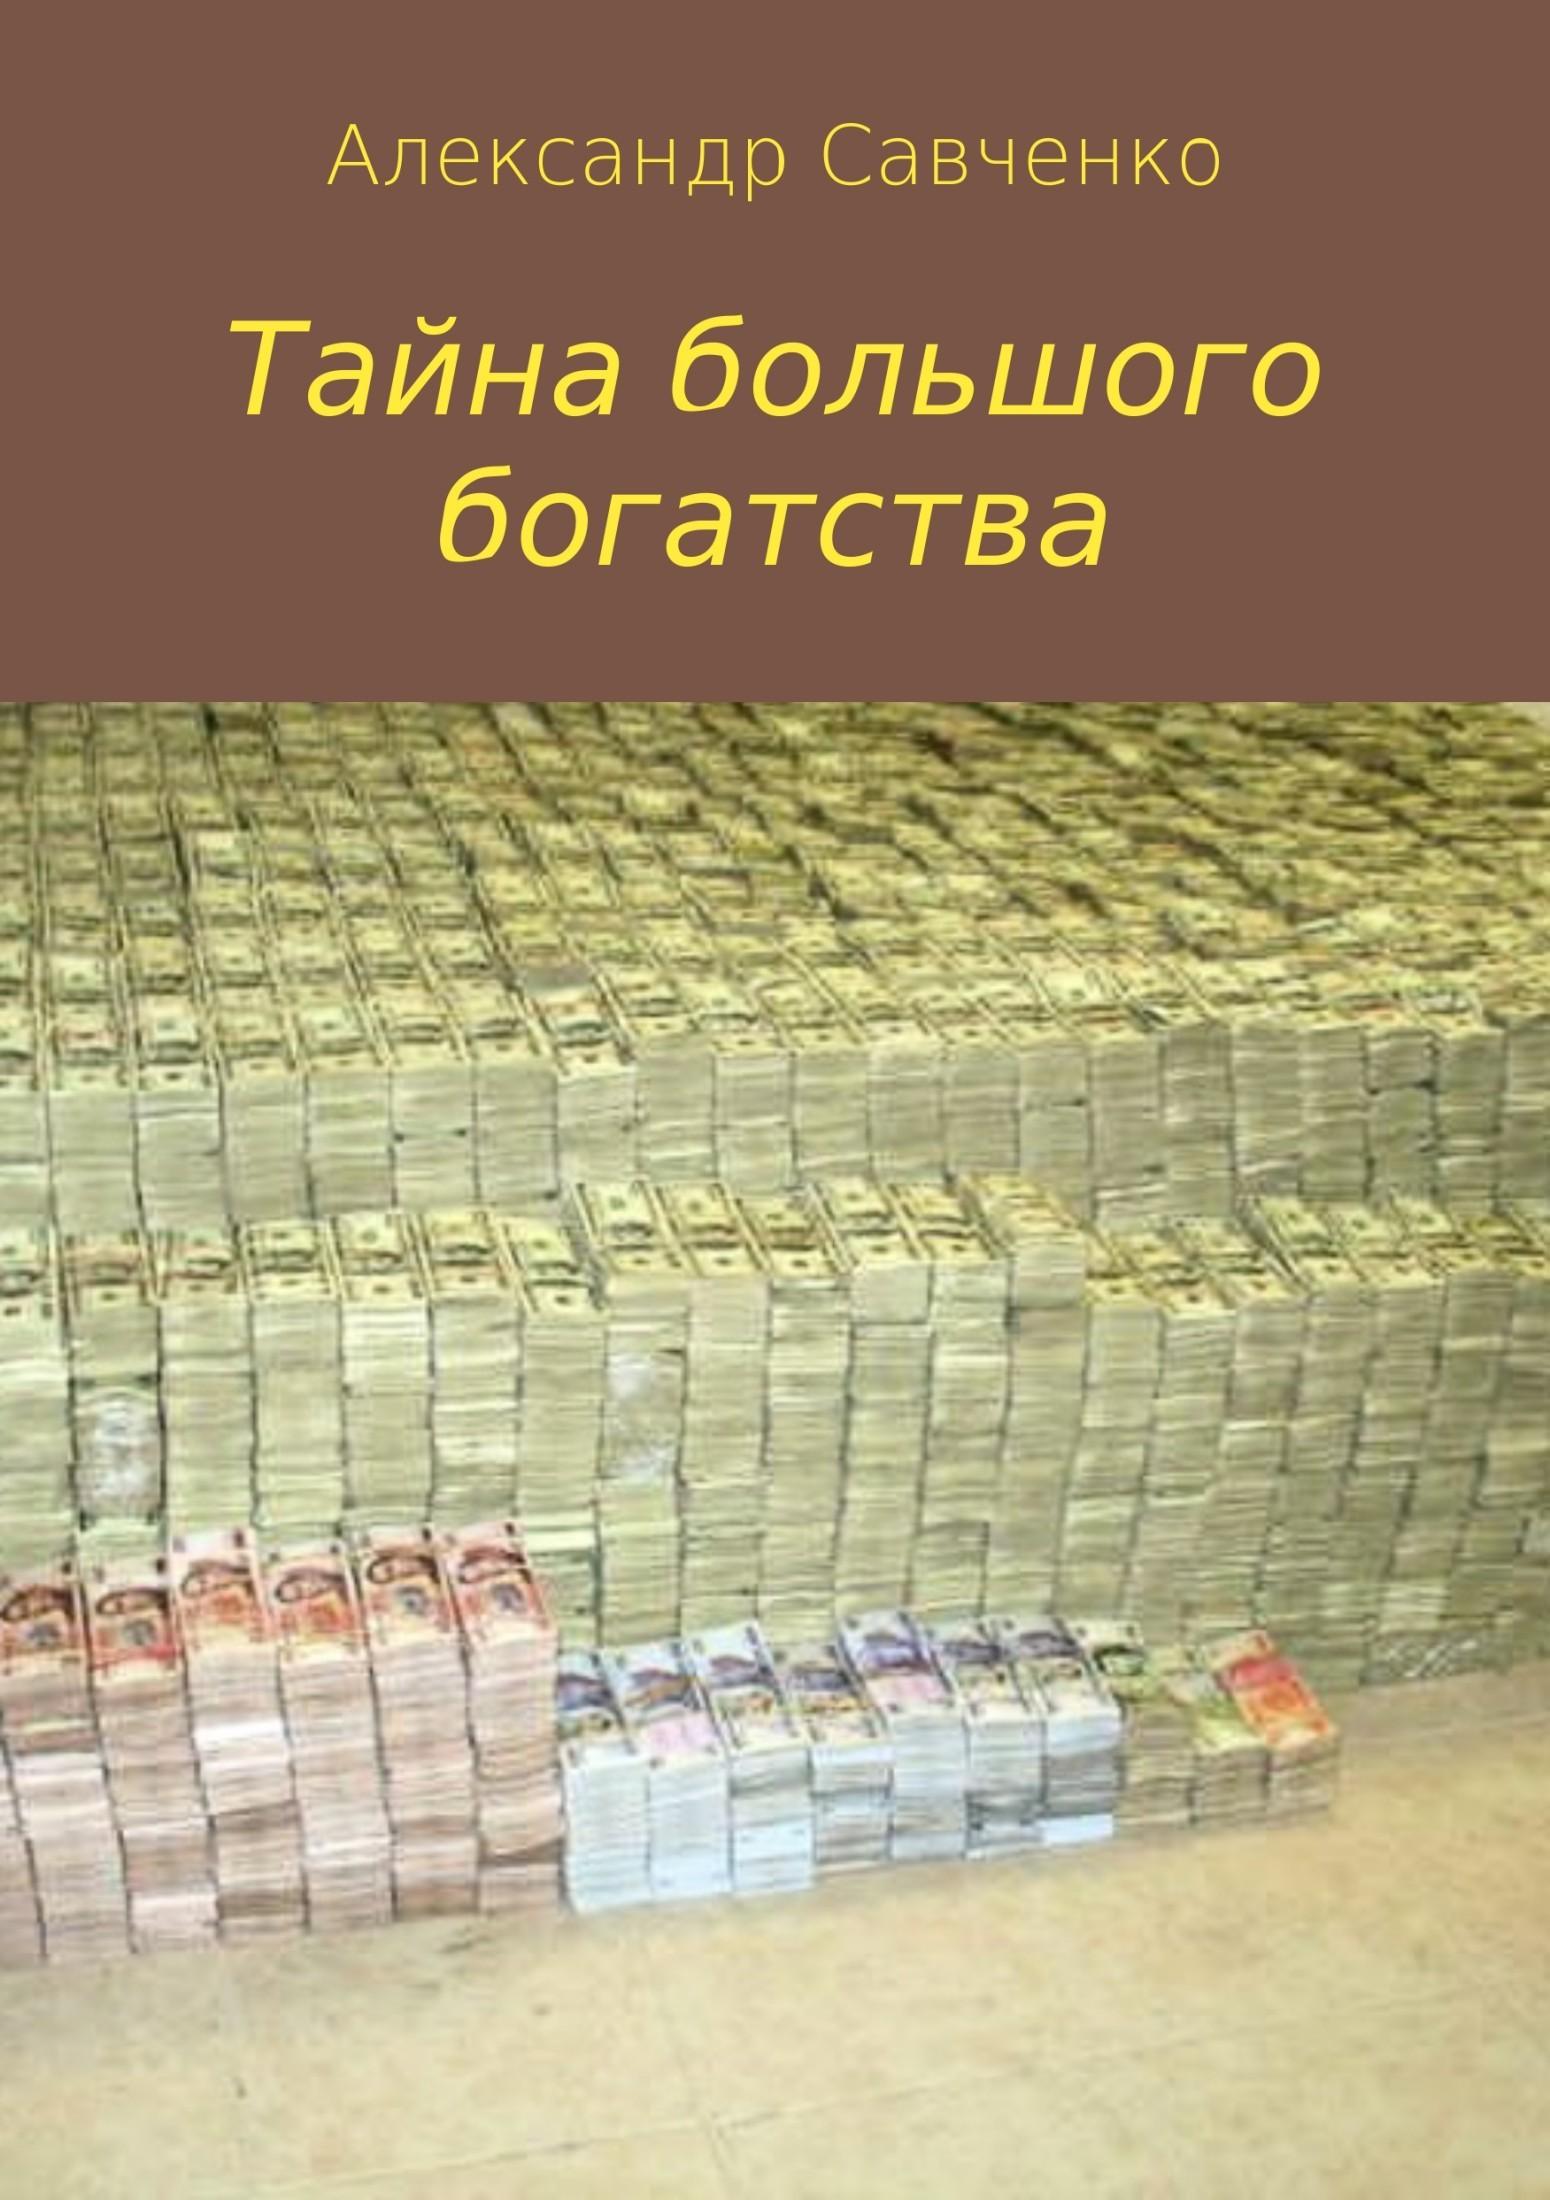 Александр Вячеславович Савченко Тайна большого богатства валдинс и тайна притяжения богатства